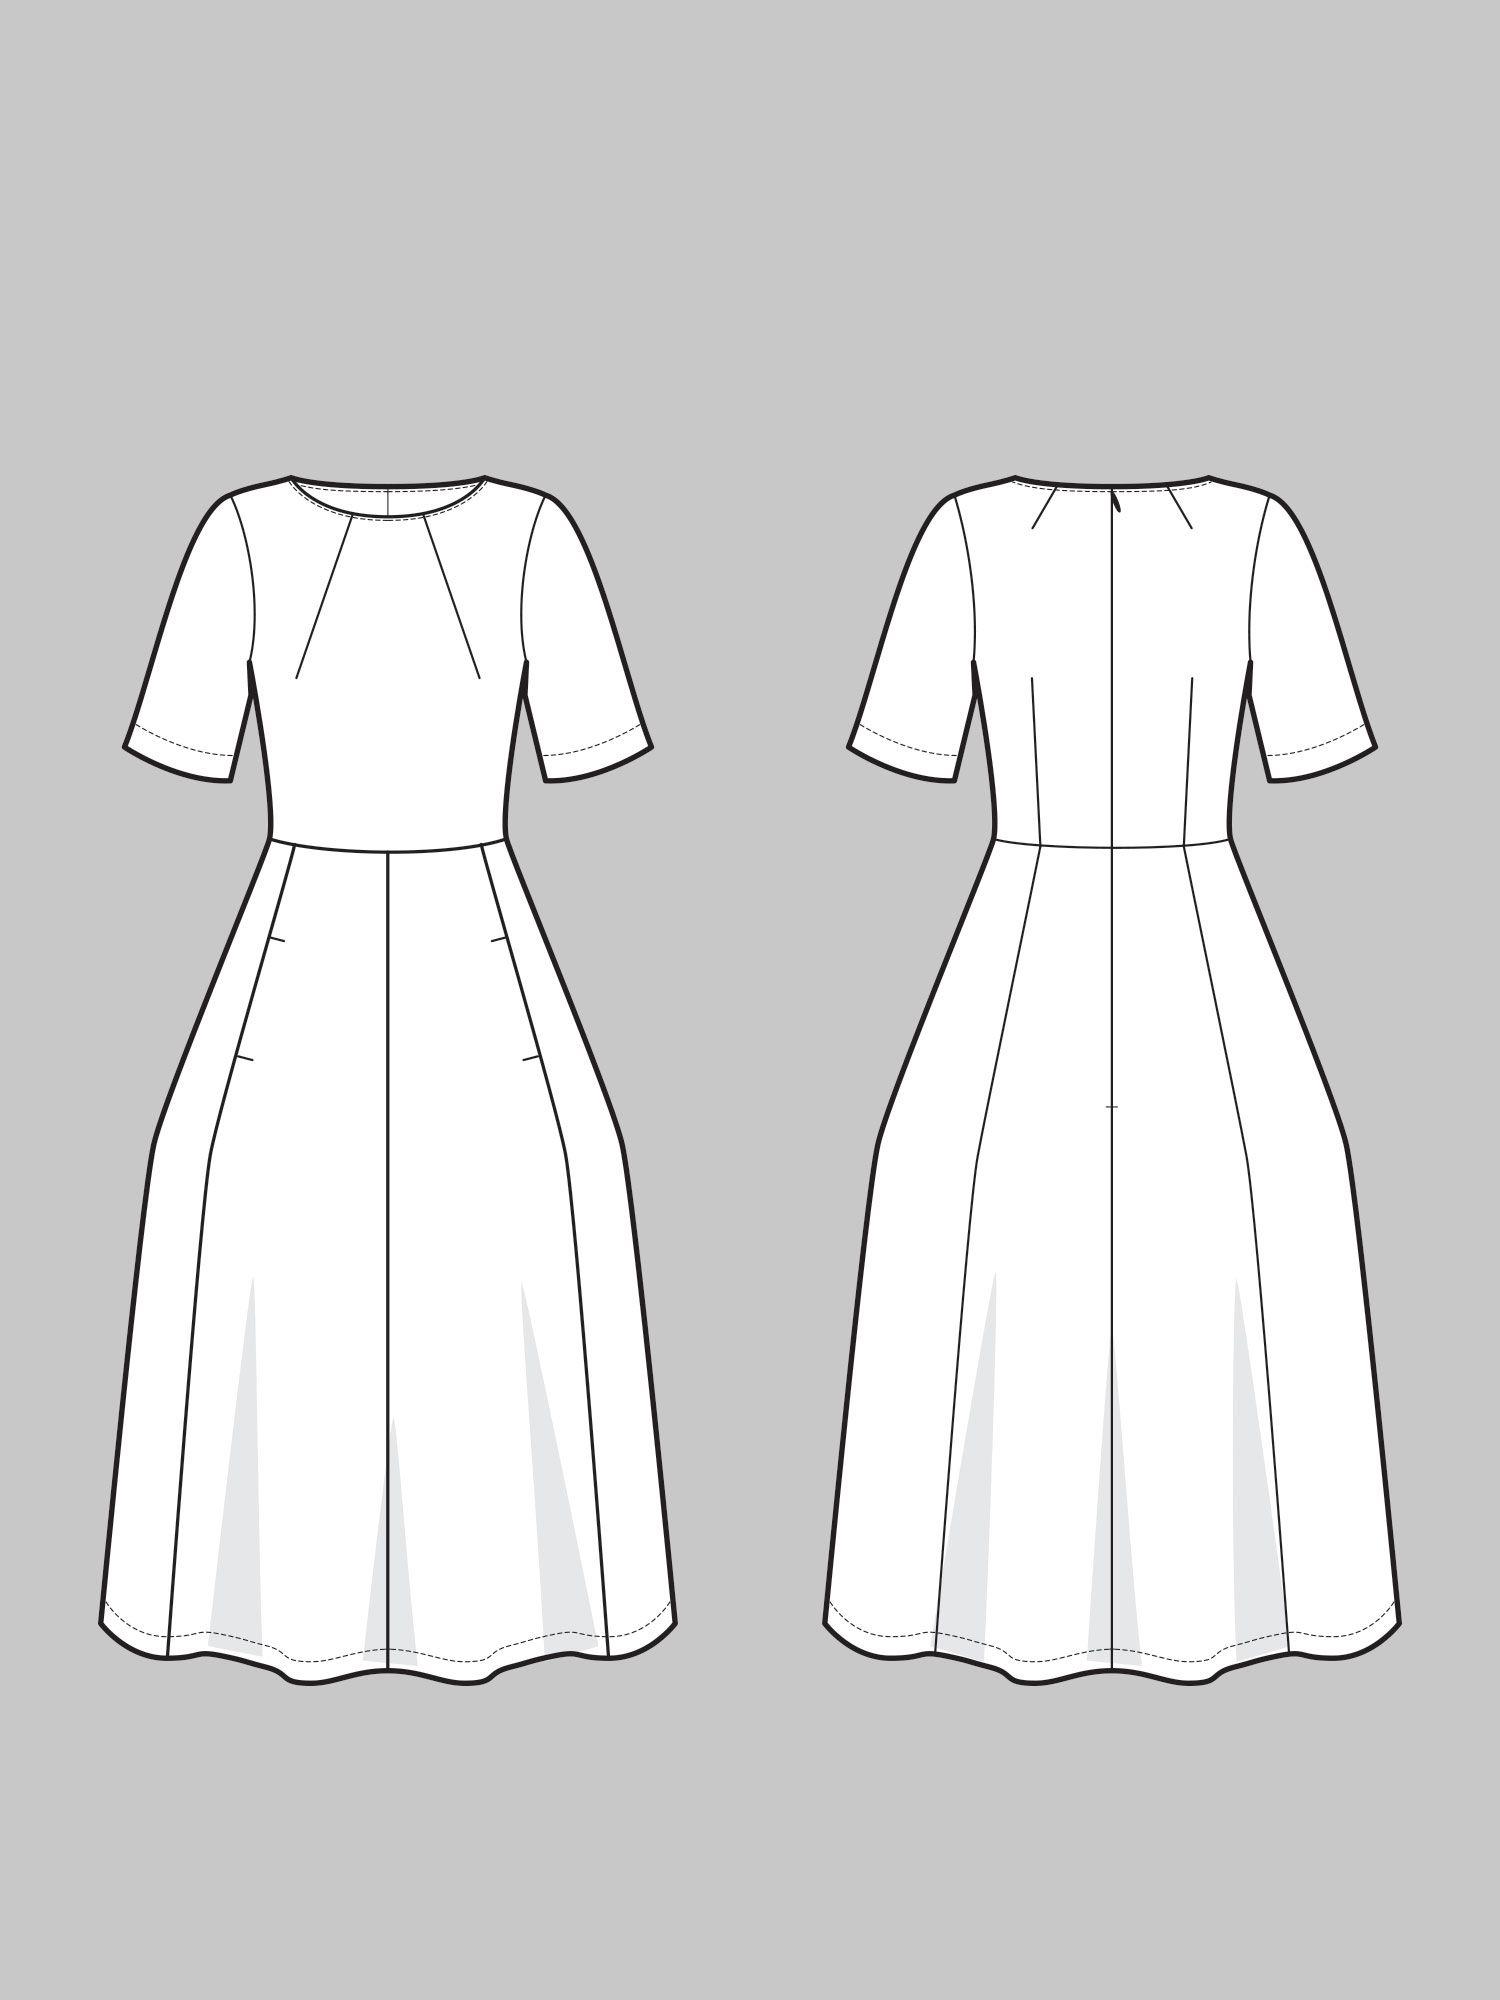 78cdc2178 AUDREY DRESS